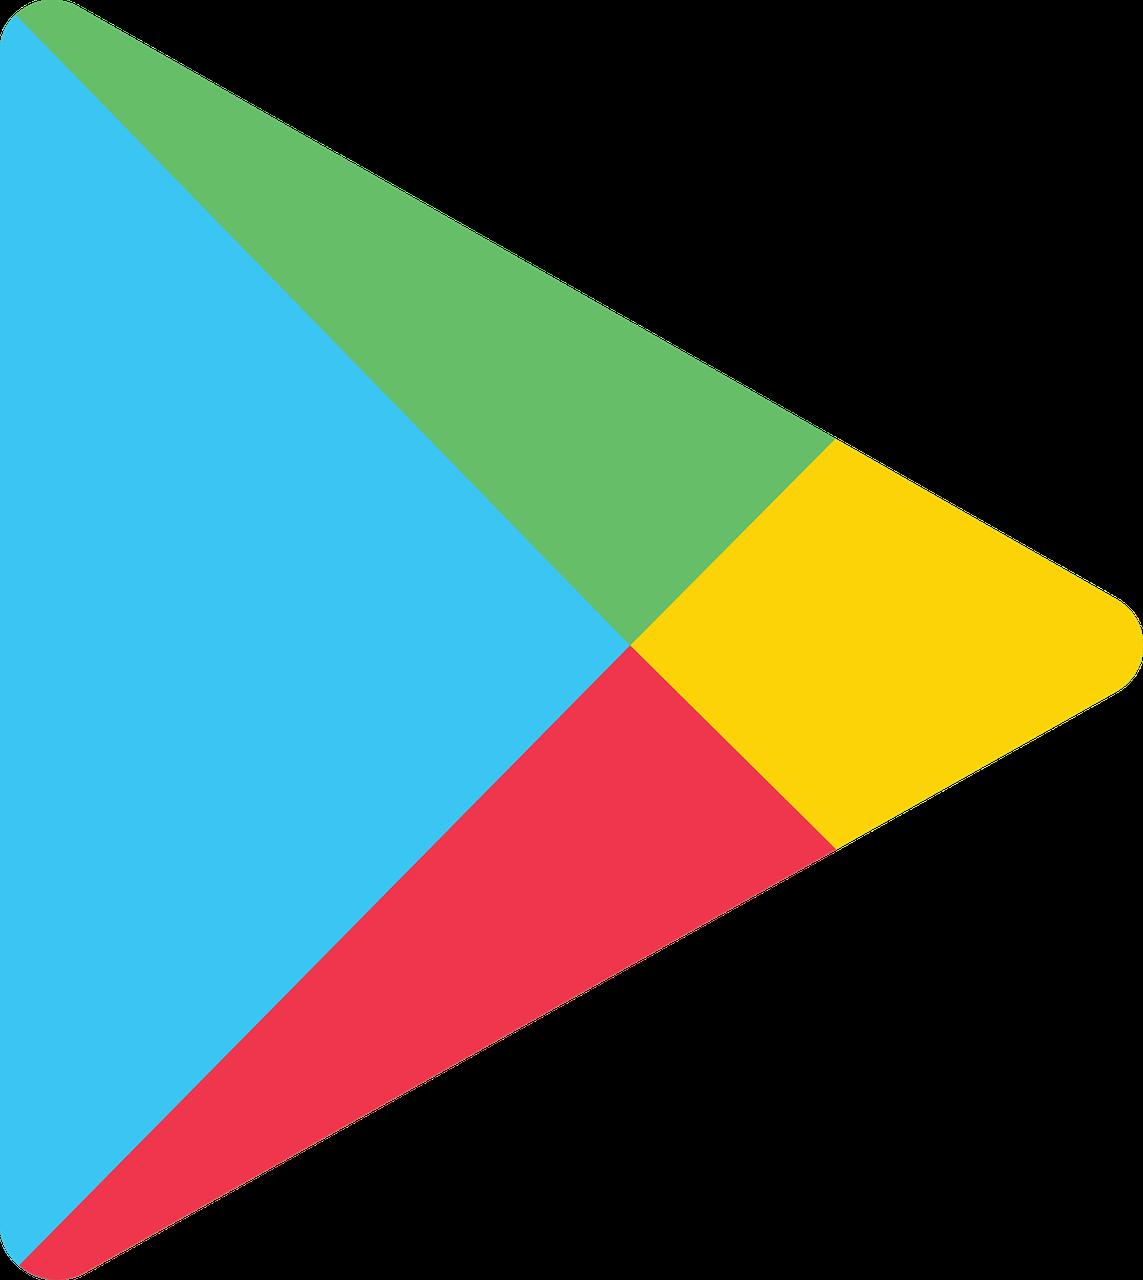 Download Pending Play Store Quick Fix - TechHX